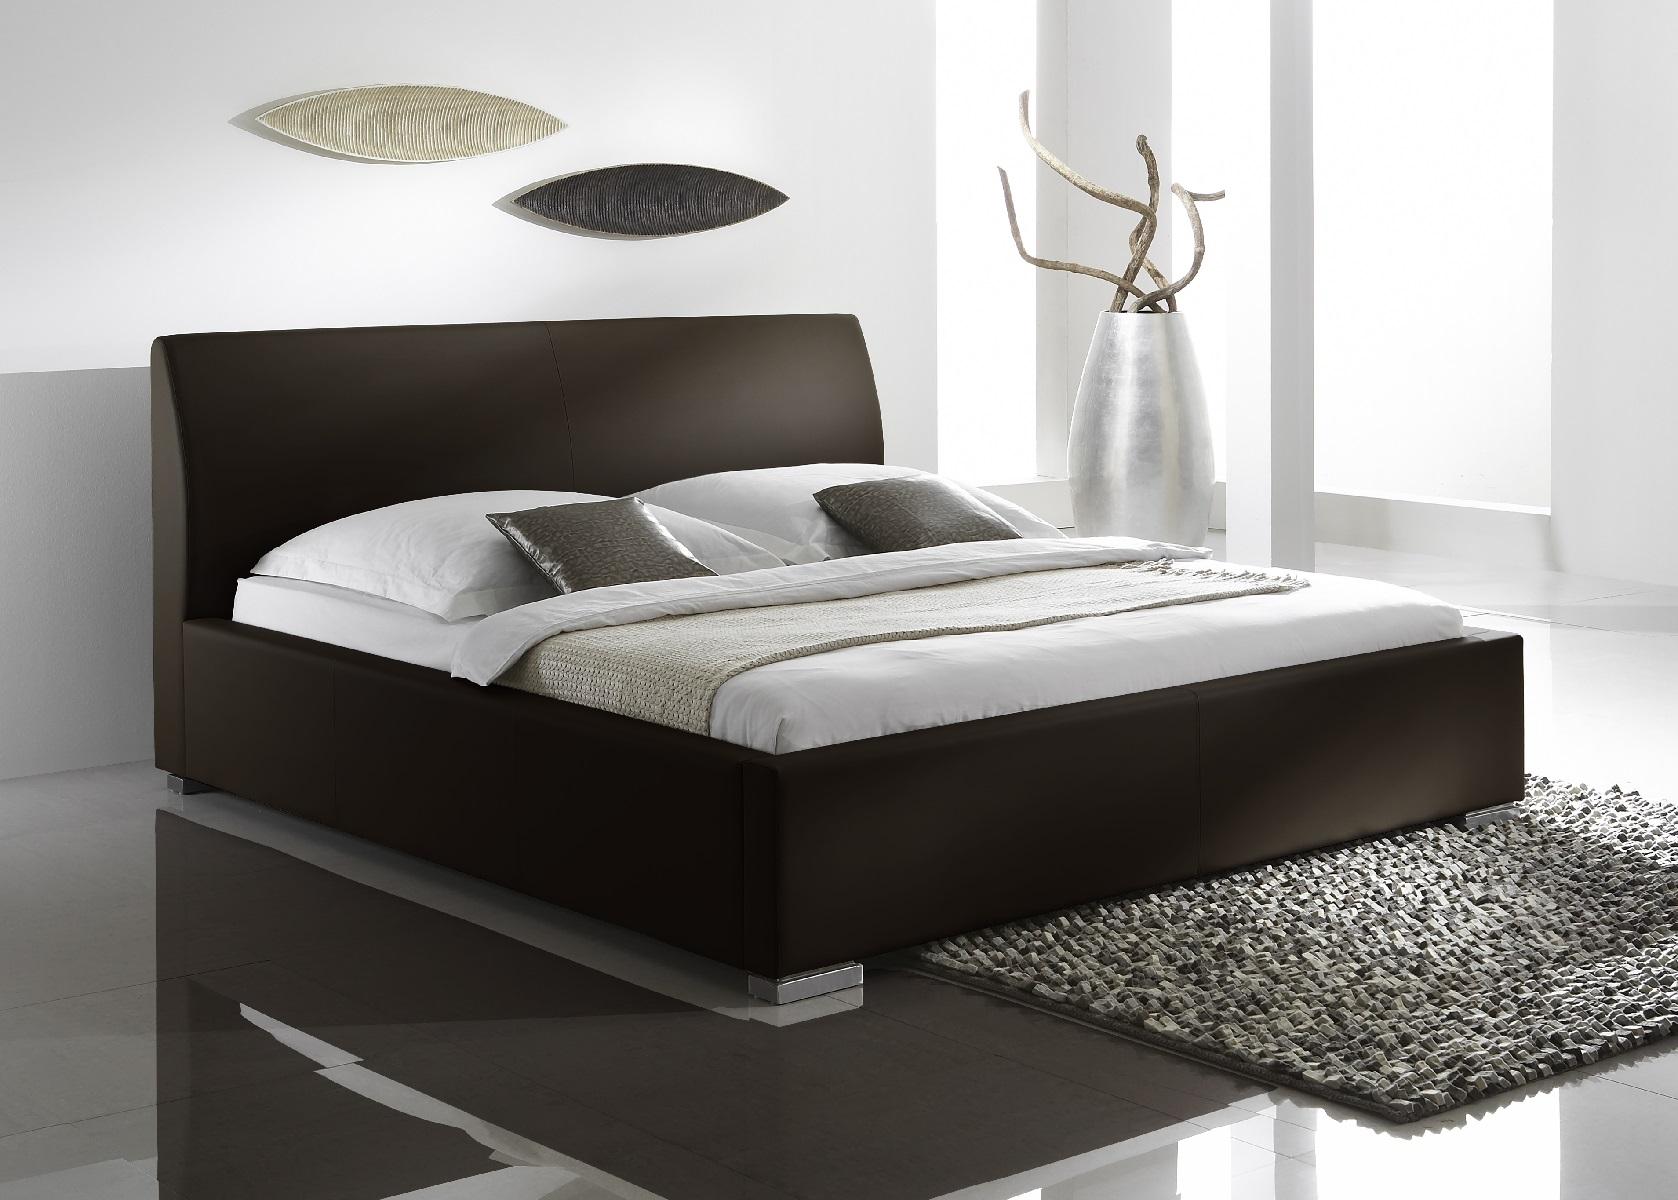 polsterbett altora braun polsterbetten betten. Black Bedroom Furniture Sets. Home Design Ideas